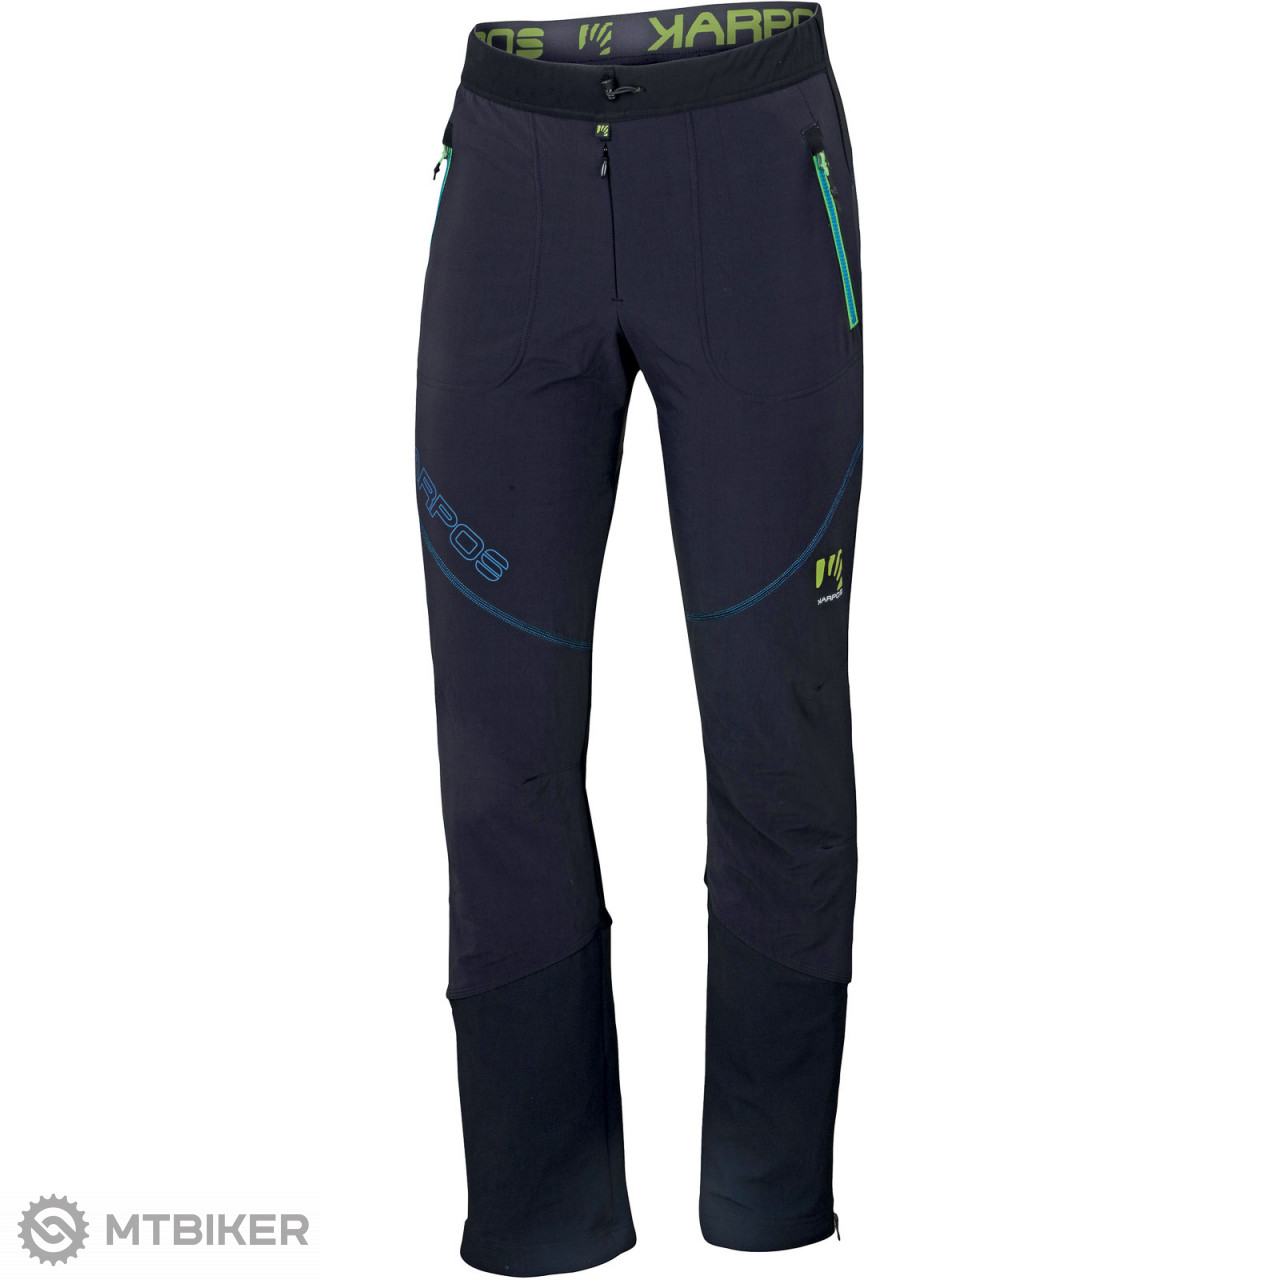 5093e7316e59 Karpos ALAGNA PLUS nohavice čierne modré - MTBIKER Shop